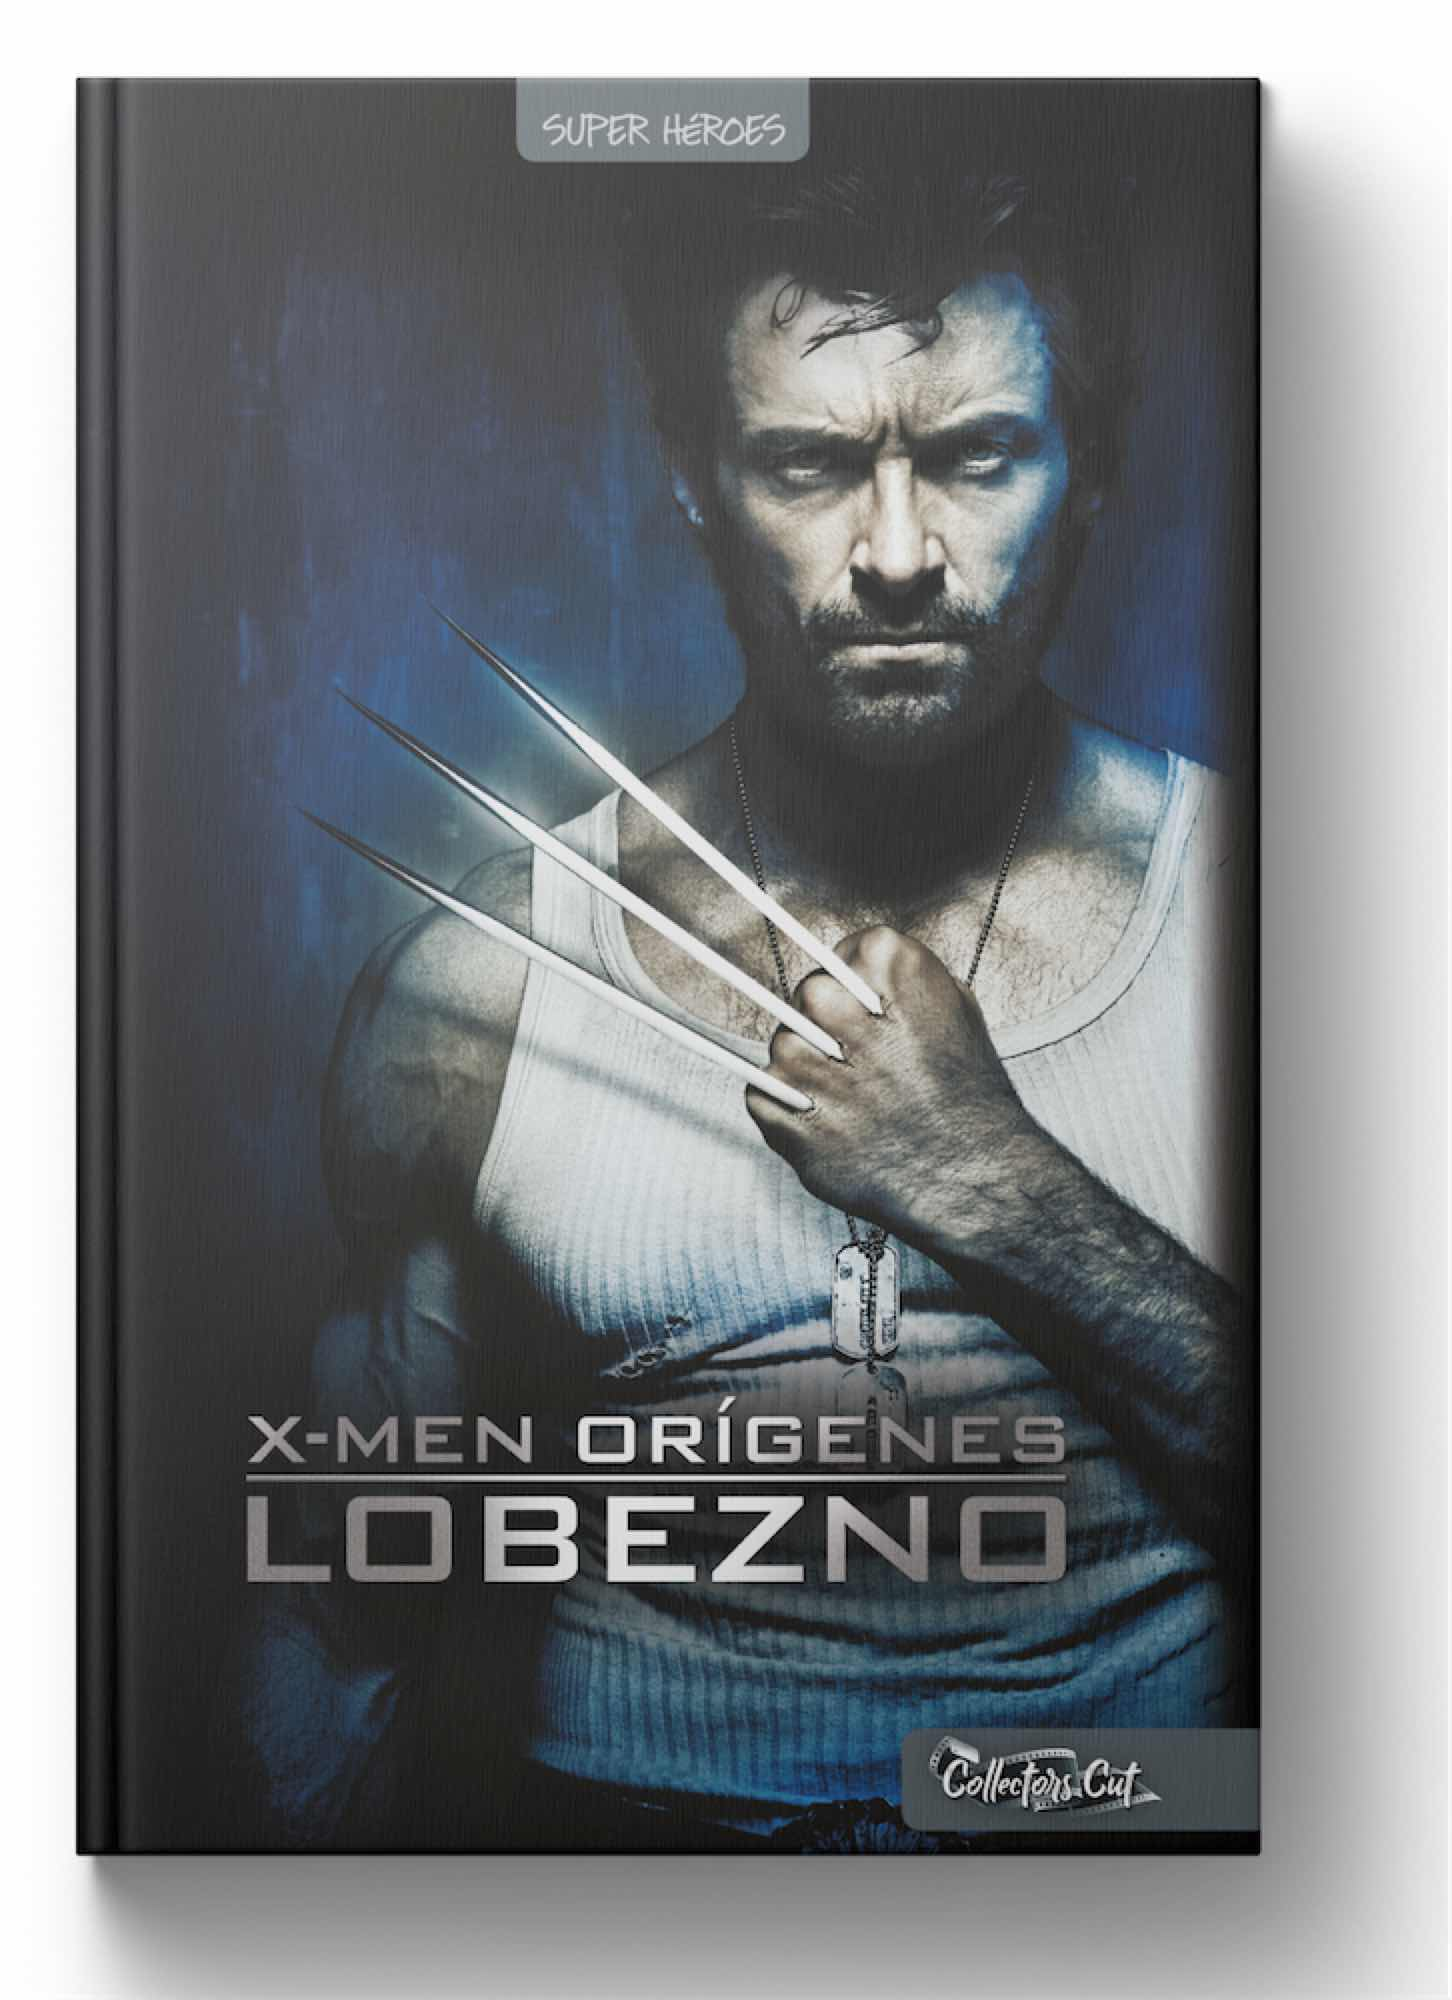 X-MEN ORIGENES. LOBEZNO (COLLECTOR'S CUT)